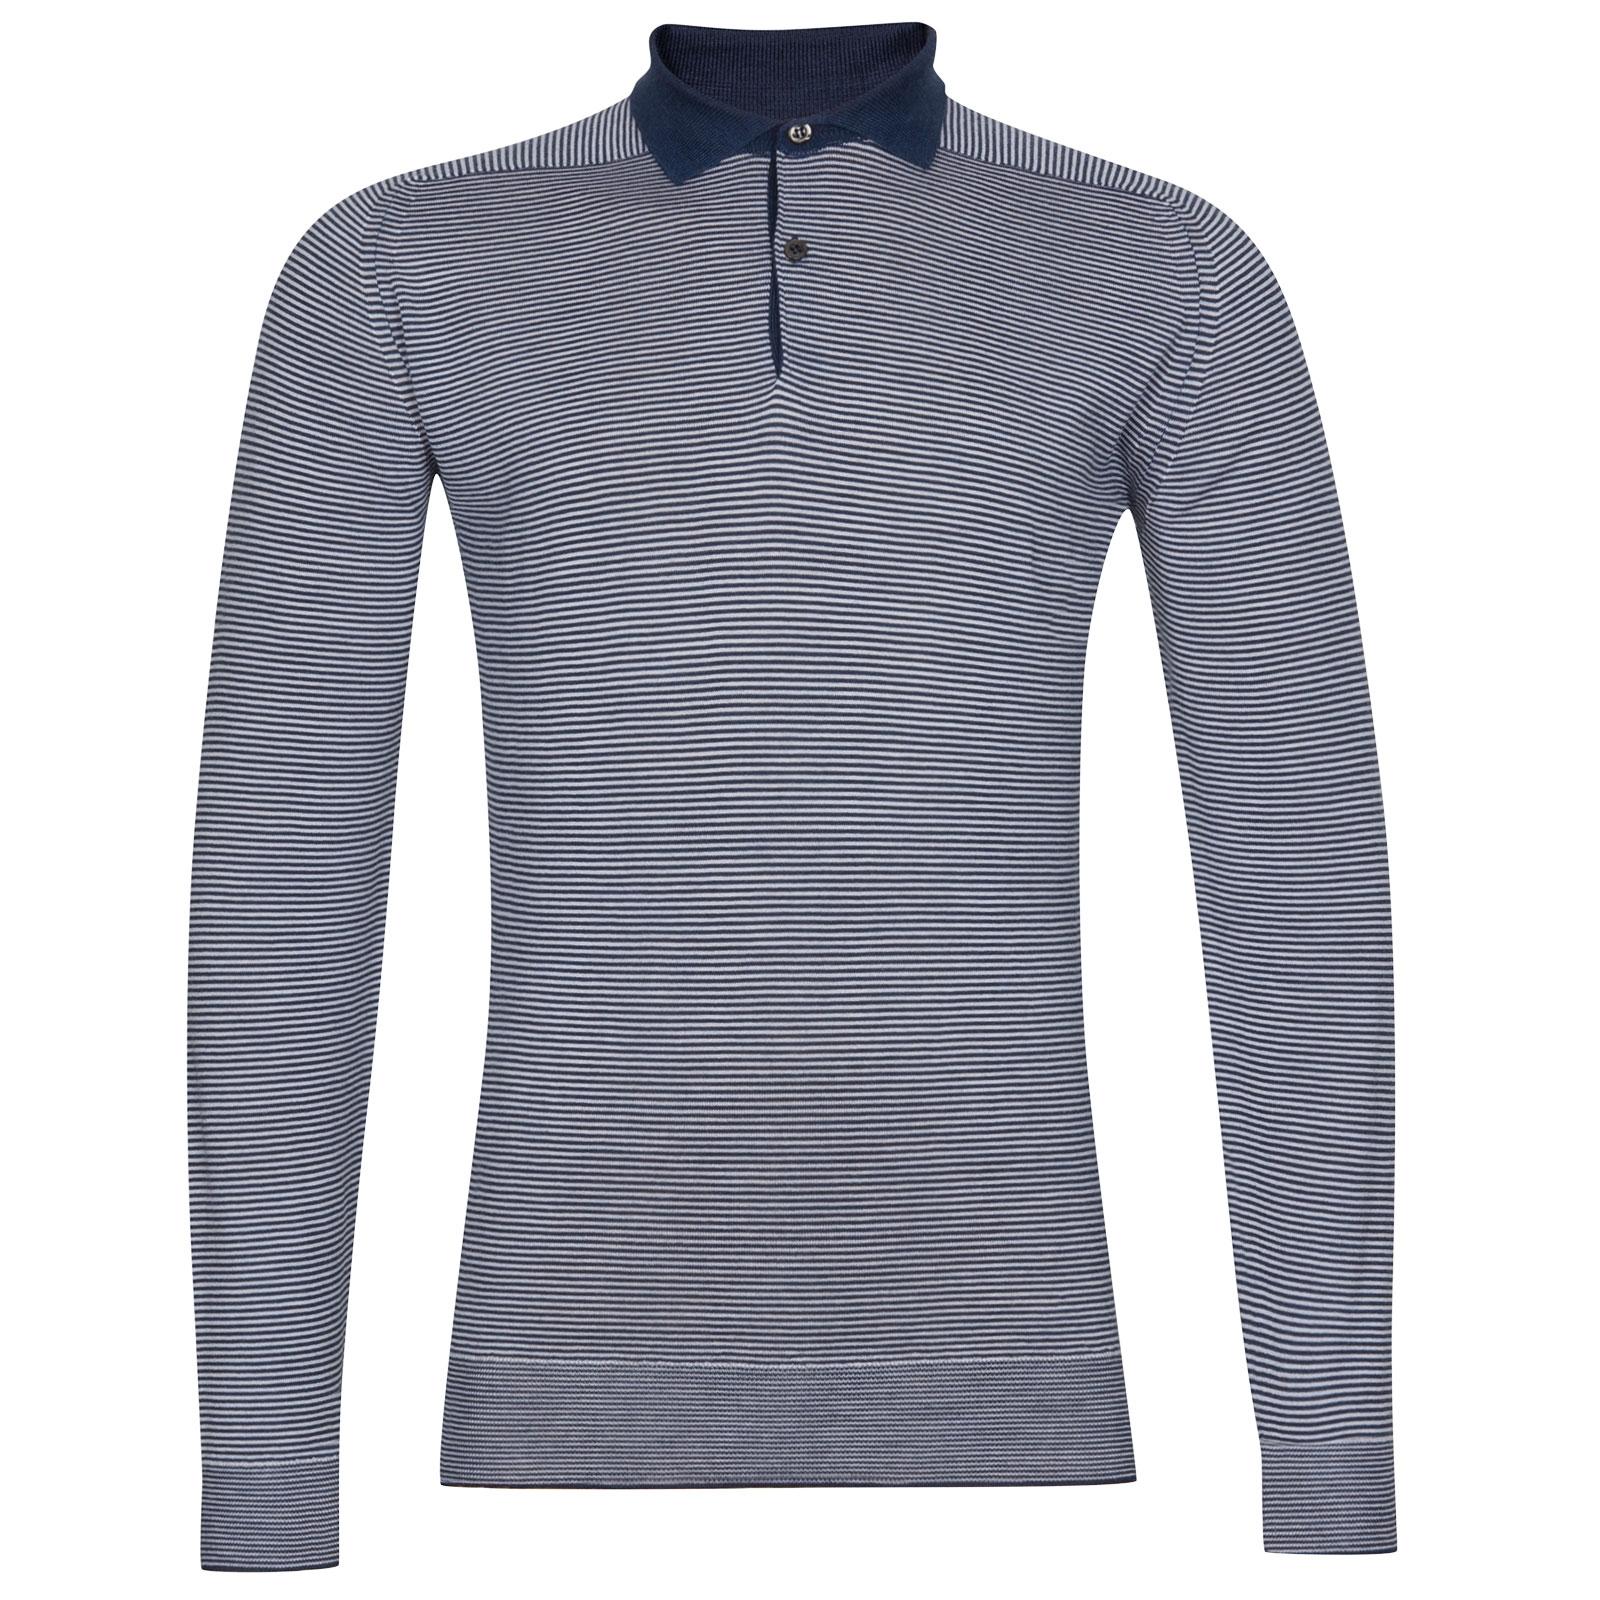 John Smedley Bunson Extra Fine Merino Shirt in Orion Green-XXL